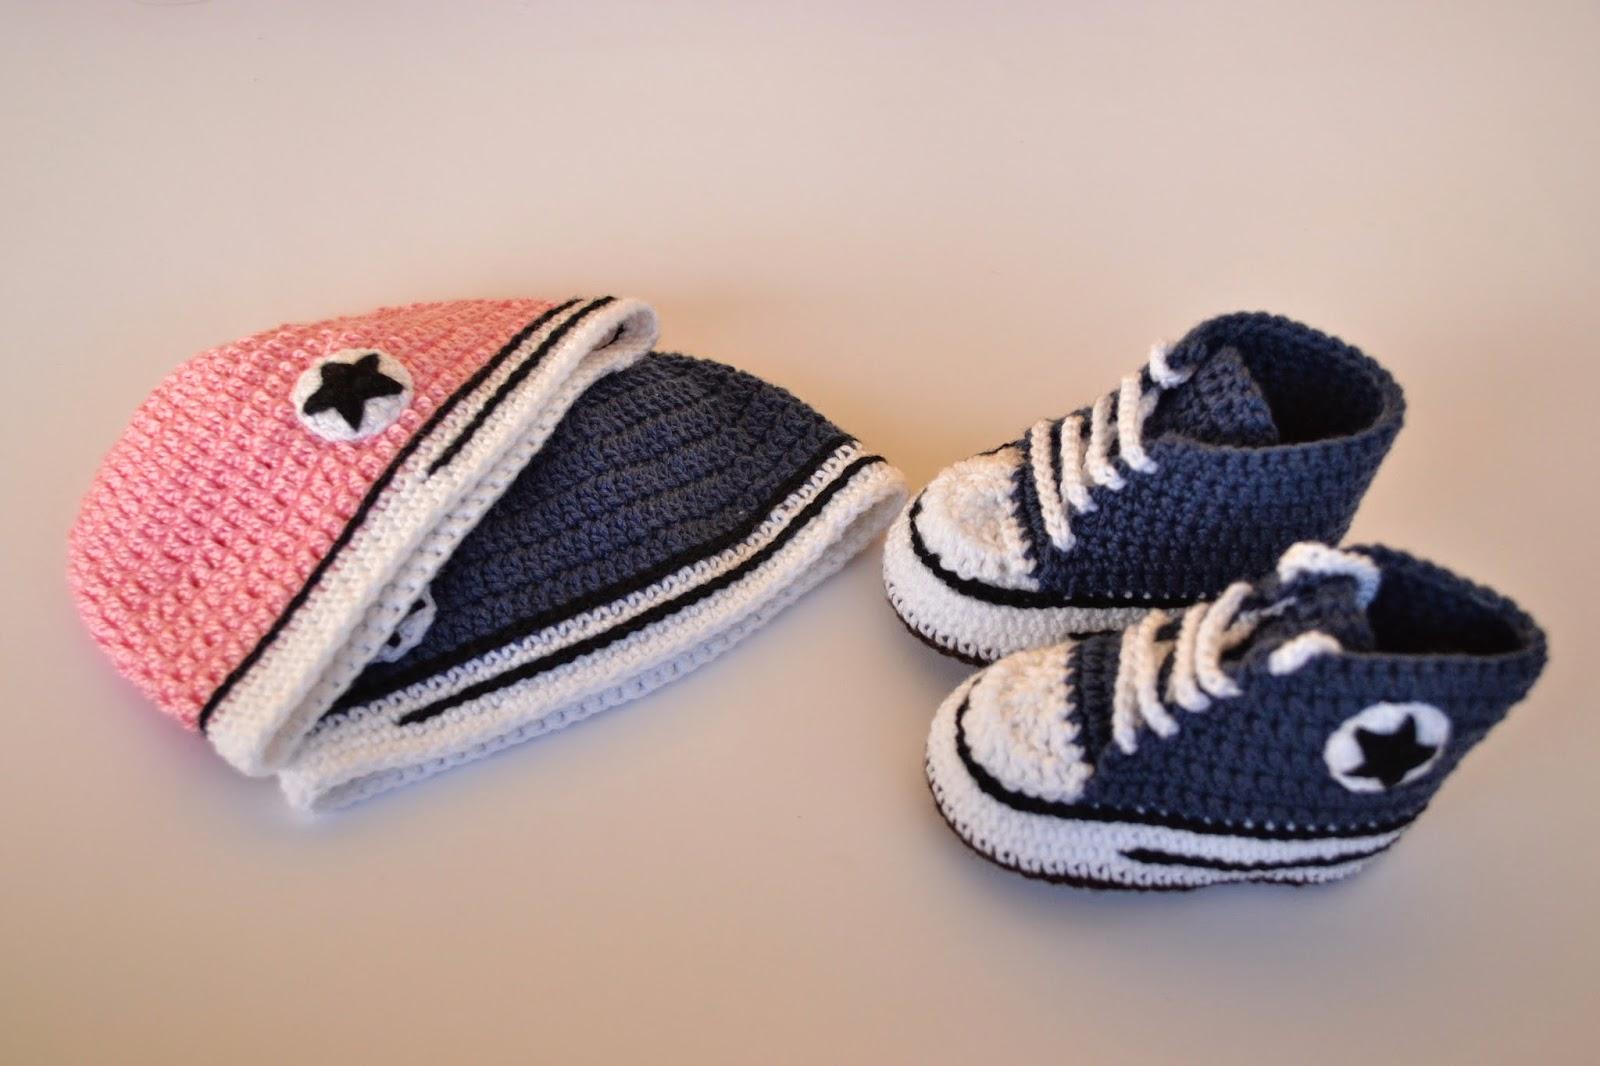 Baby Boots: Gorros de crochet estilo Converse